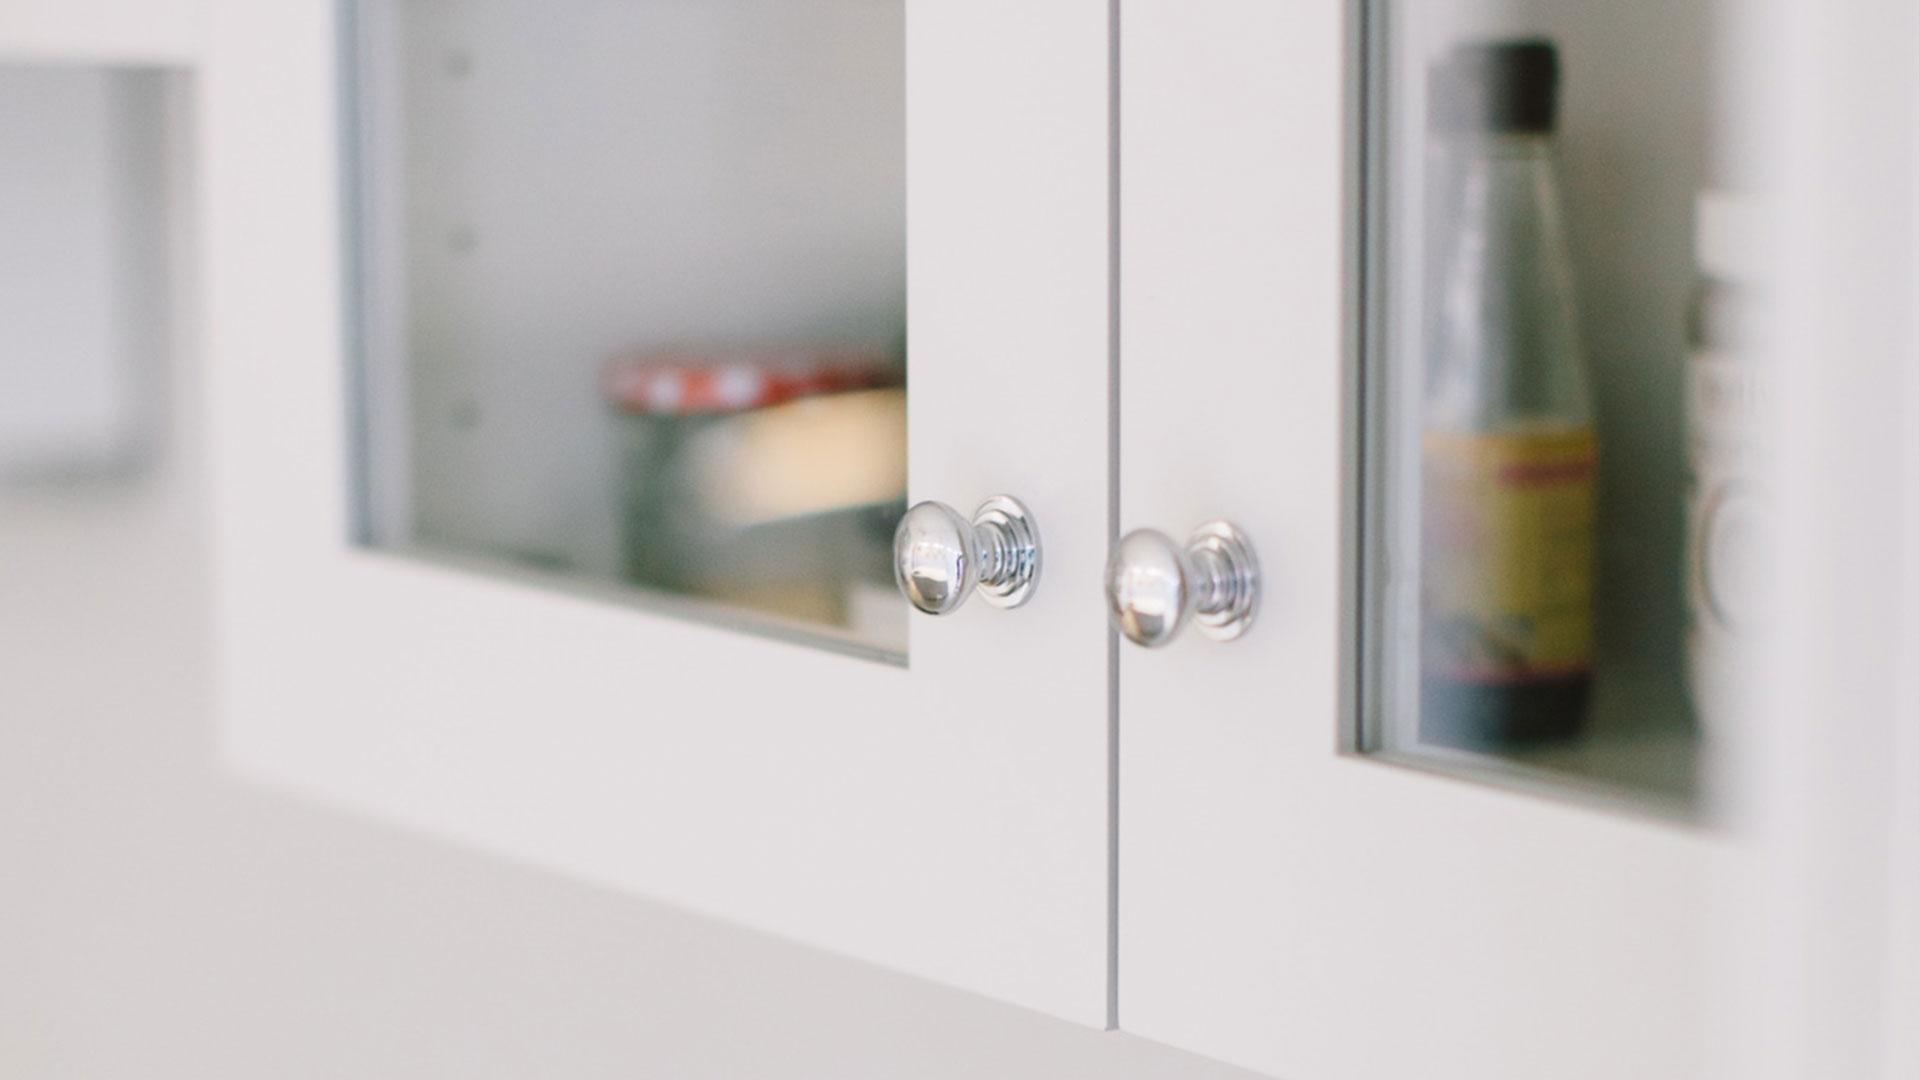 Bespoke Kitchen Cabinet Doors - Nagpurentrepreneurs